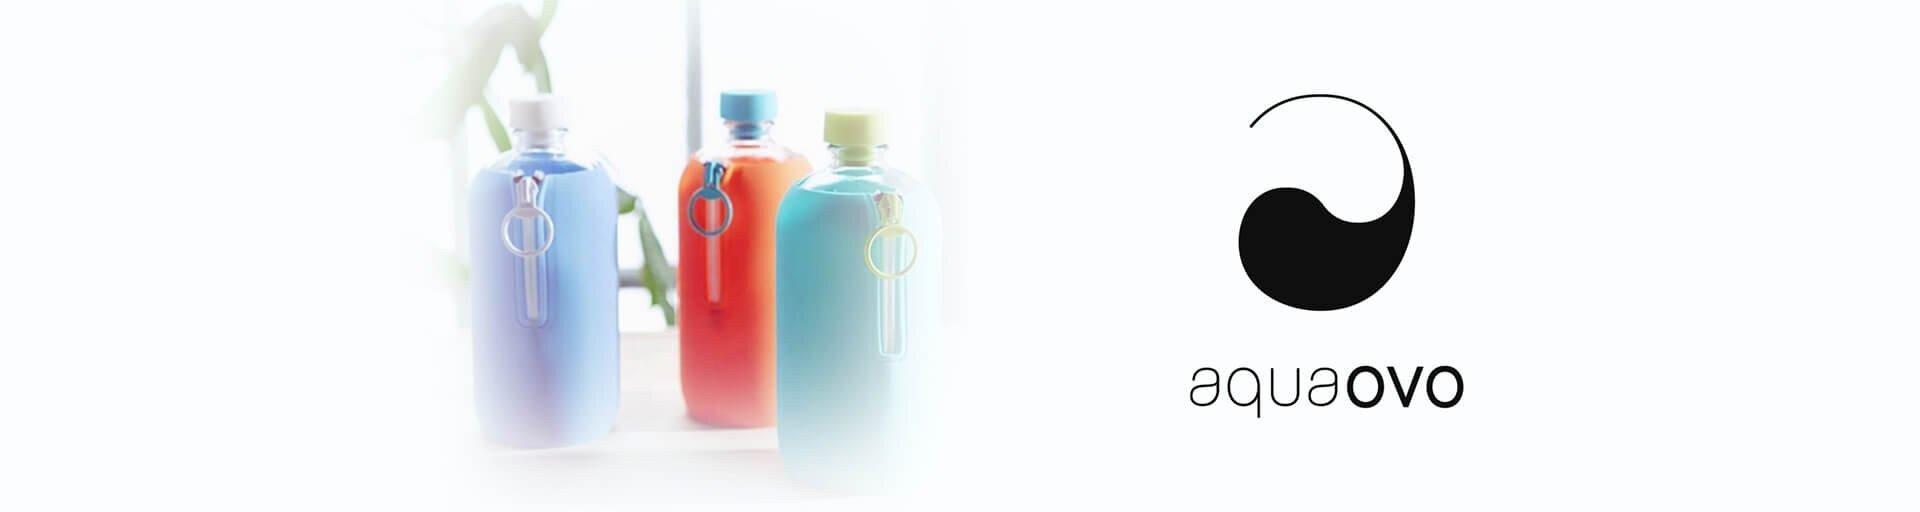 Aquaovo